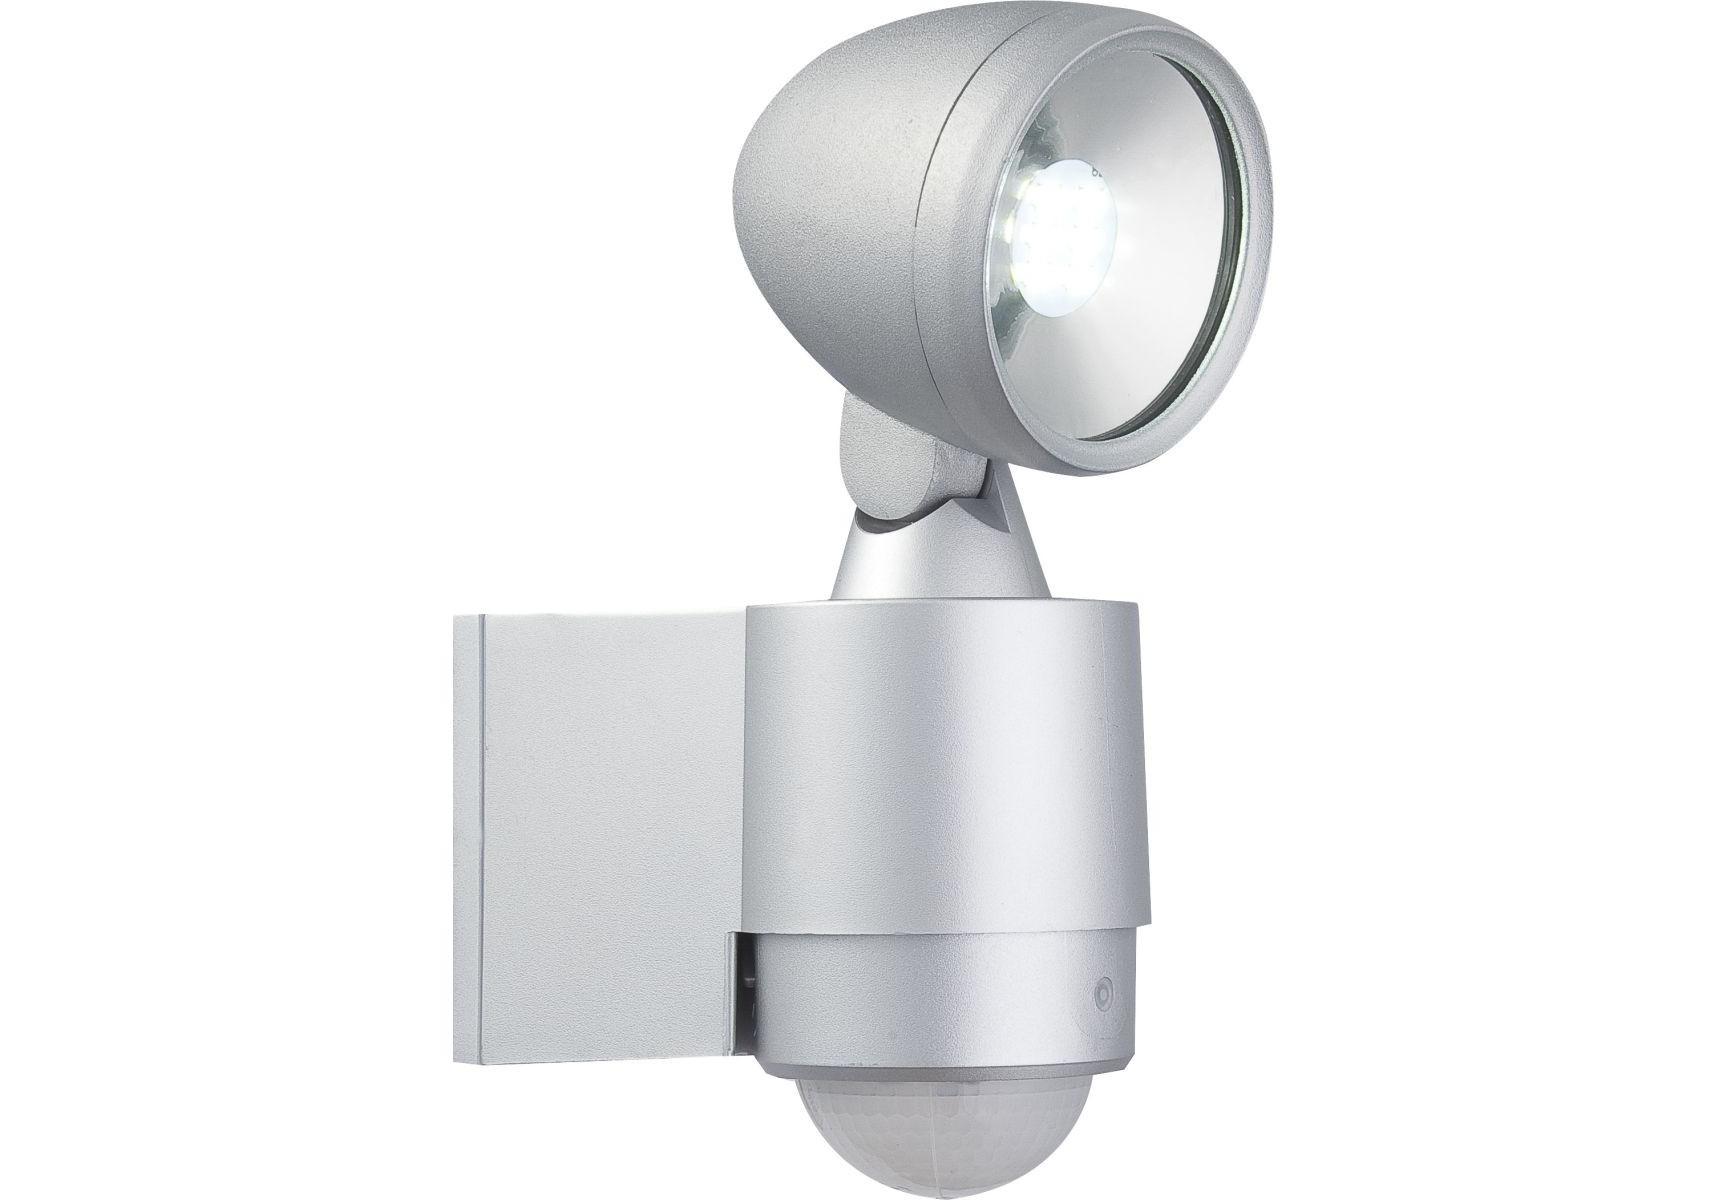 Светильник уличныйУличные настенные светильники<br>&amp;lt;div&amp;gt;Вид цоколя: LED&amp;lt;/div&amp;gt;&amp;lt;div&amp;gt;Мощность: 3W&amp;lt;/div&amp;gt;&amp;lt;div&amp;gt;Количество ламп: 1&amp;lt;/div&amp;gt;&amp;lt;div&amp;gt;Наличие ламп: есть&amp;lt;/div&amp;gt;<br><br>Material: Алюминий<br>Width см: 7<br>Depth см: 13,5<br>Height см: 17